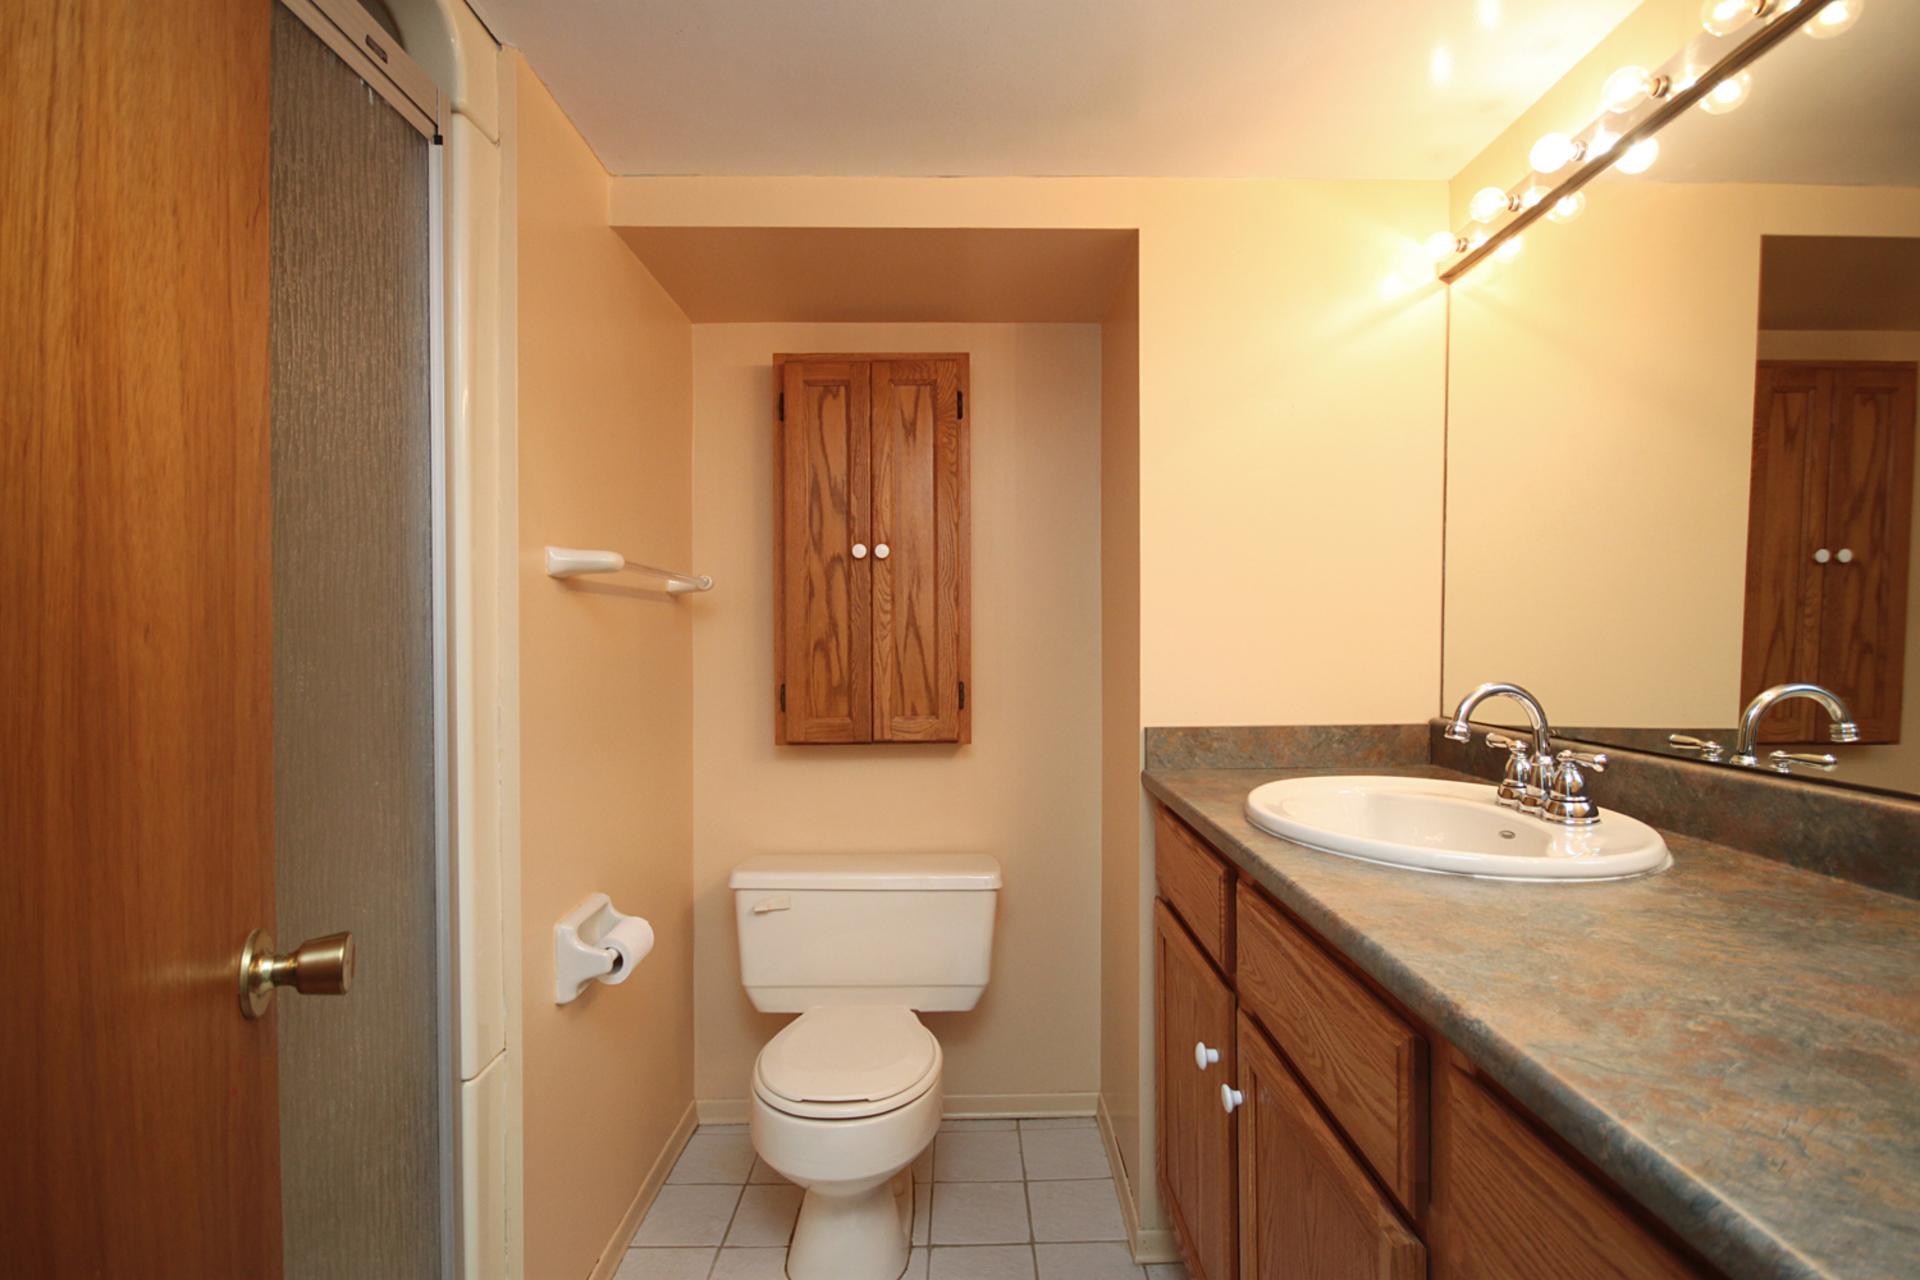 3 Piece Bathroom at 31 Groveland Crescent, Parkwoods-Donalda, Toronto